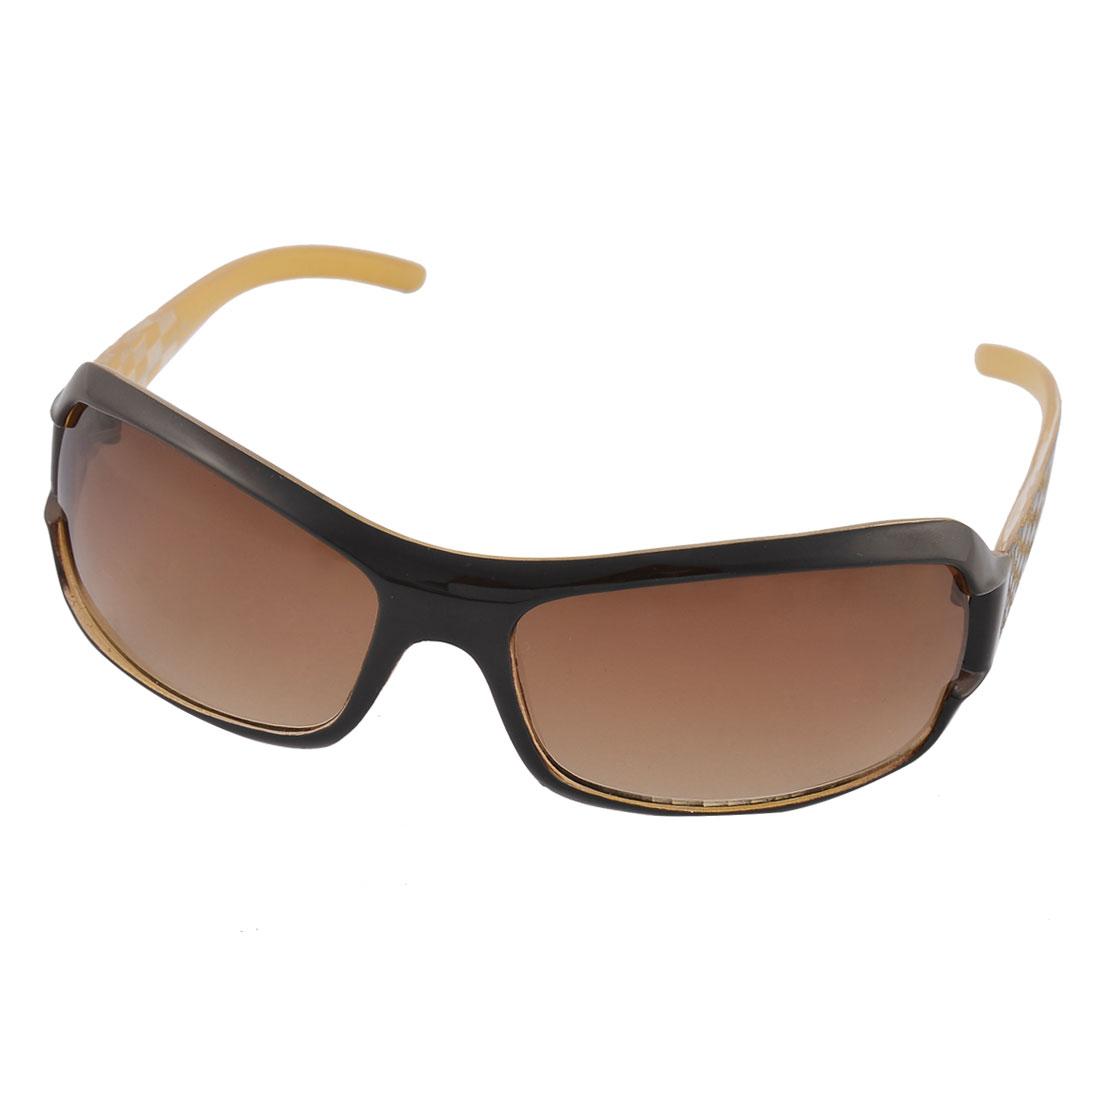 Women Plastic Full Rim Single Bridge Lens Outdoor Driving Eyewear Sunglasses